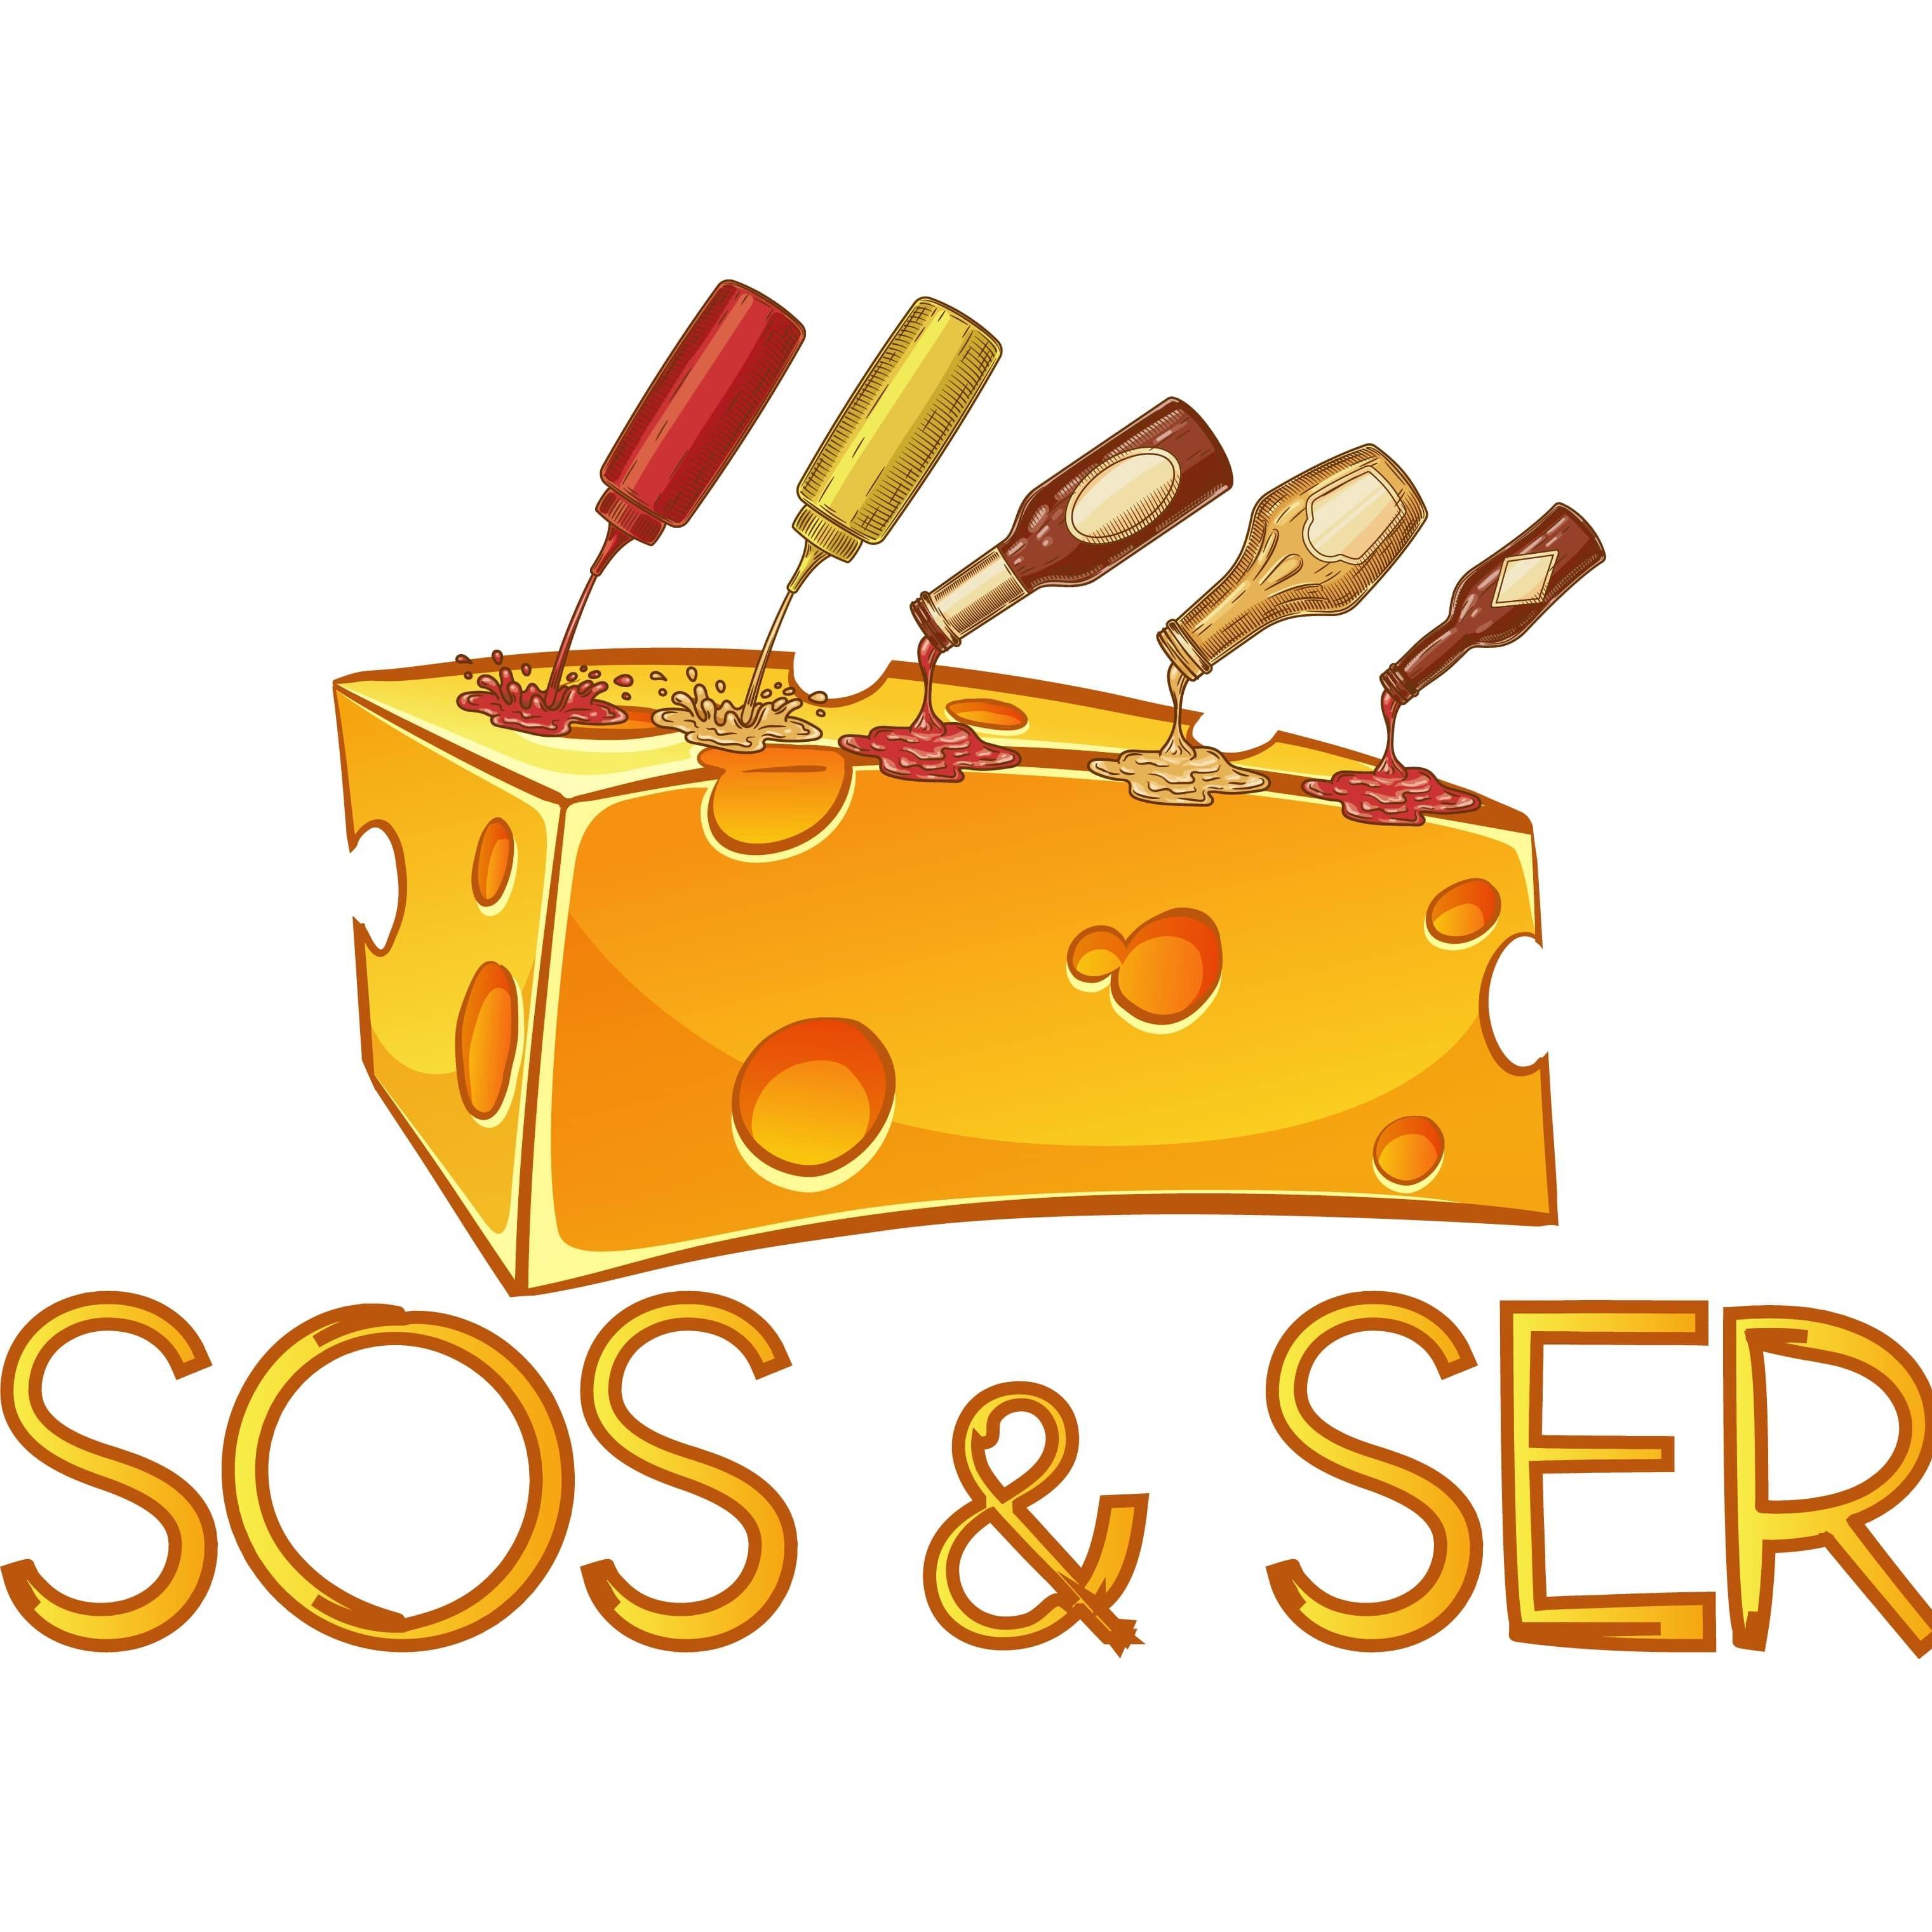 Sos & Ser